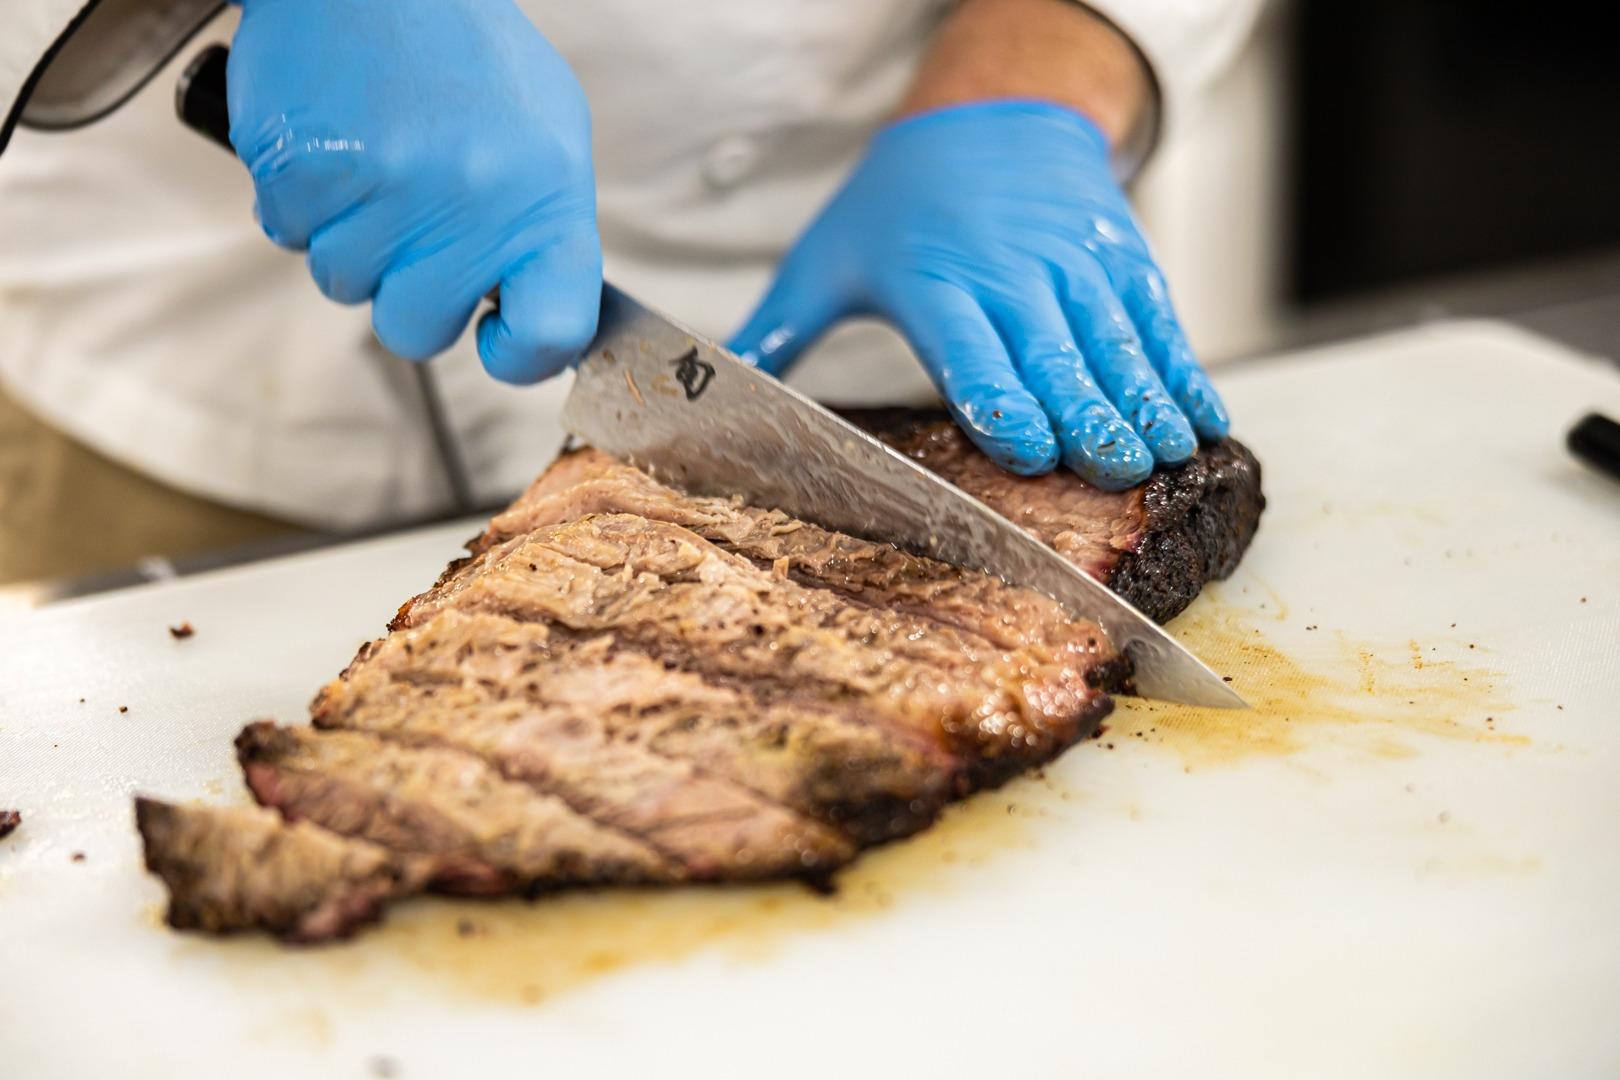 slicing brisket